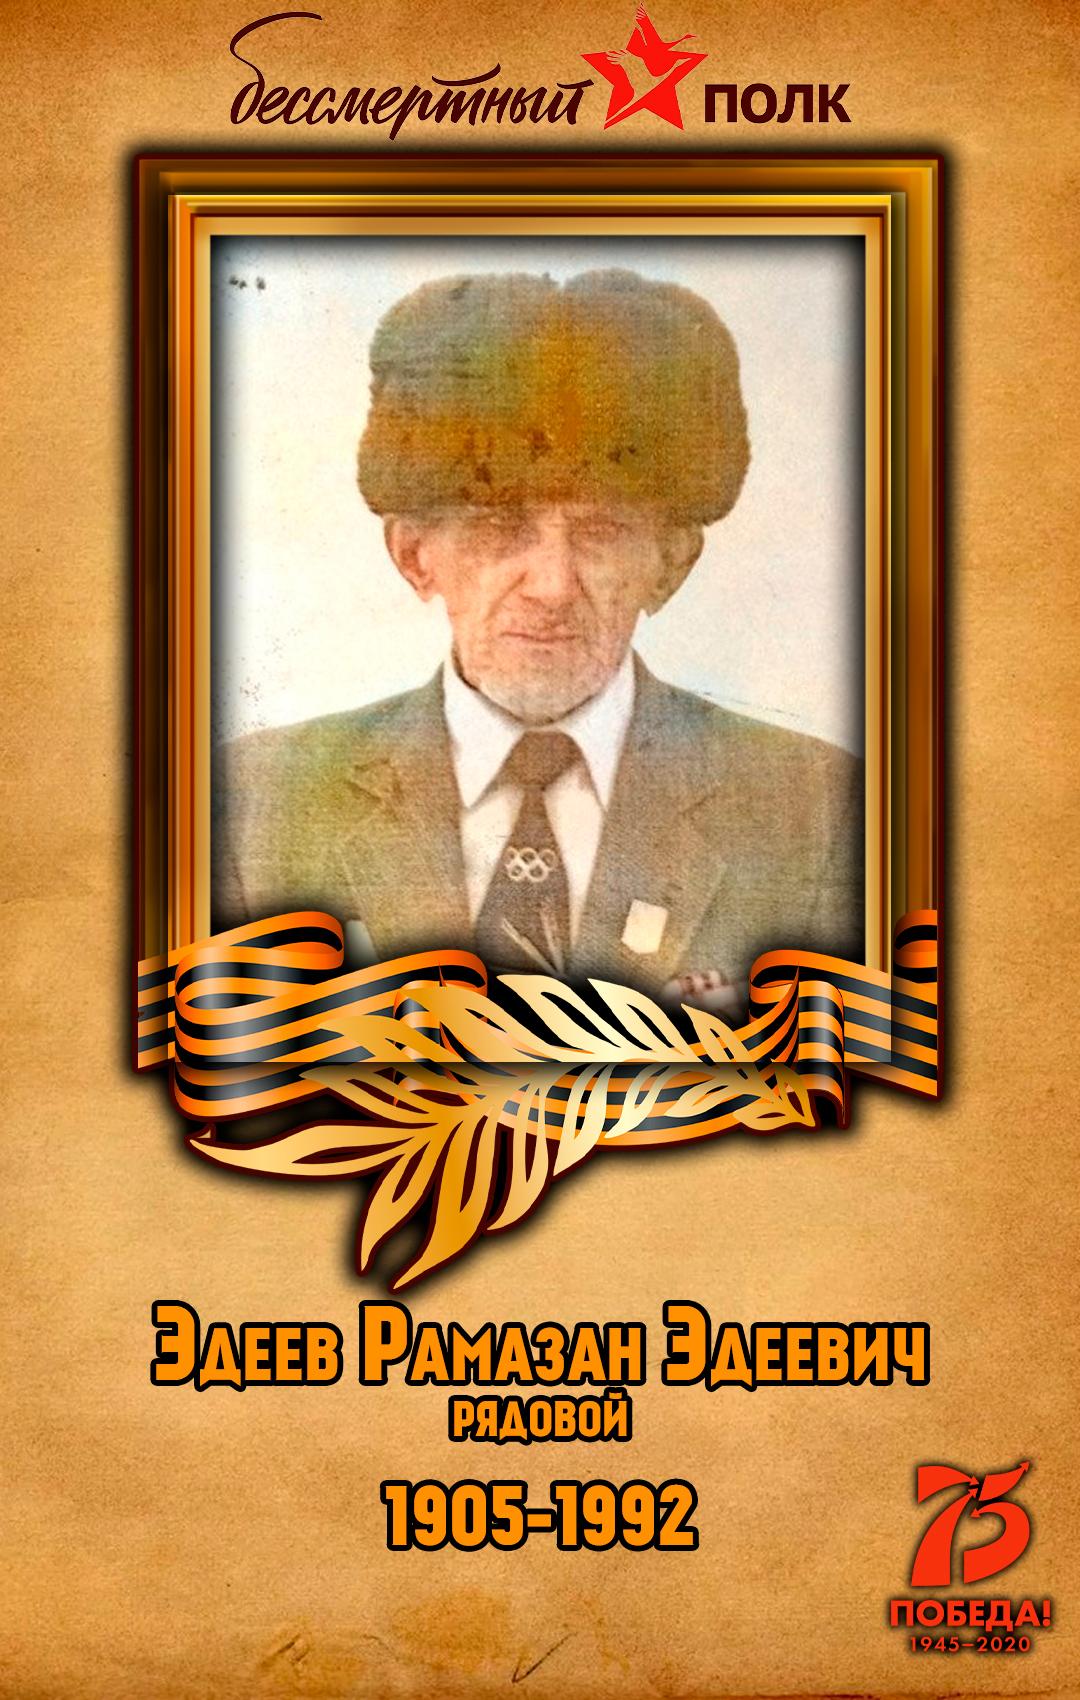 Эдеев-Рамазан-Эдеевич